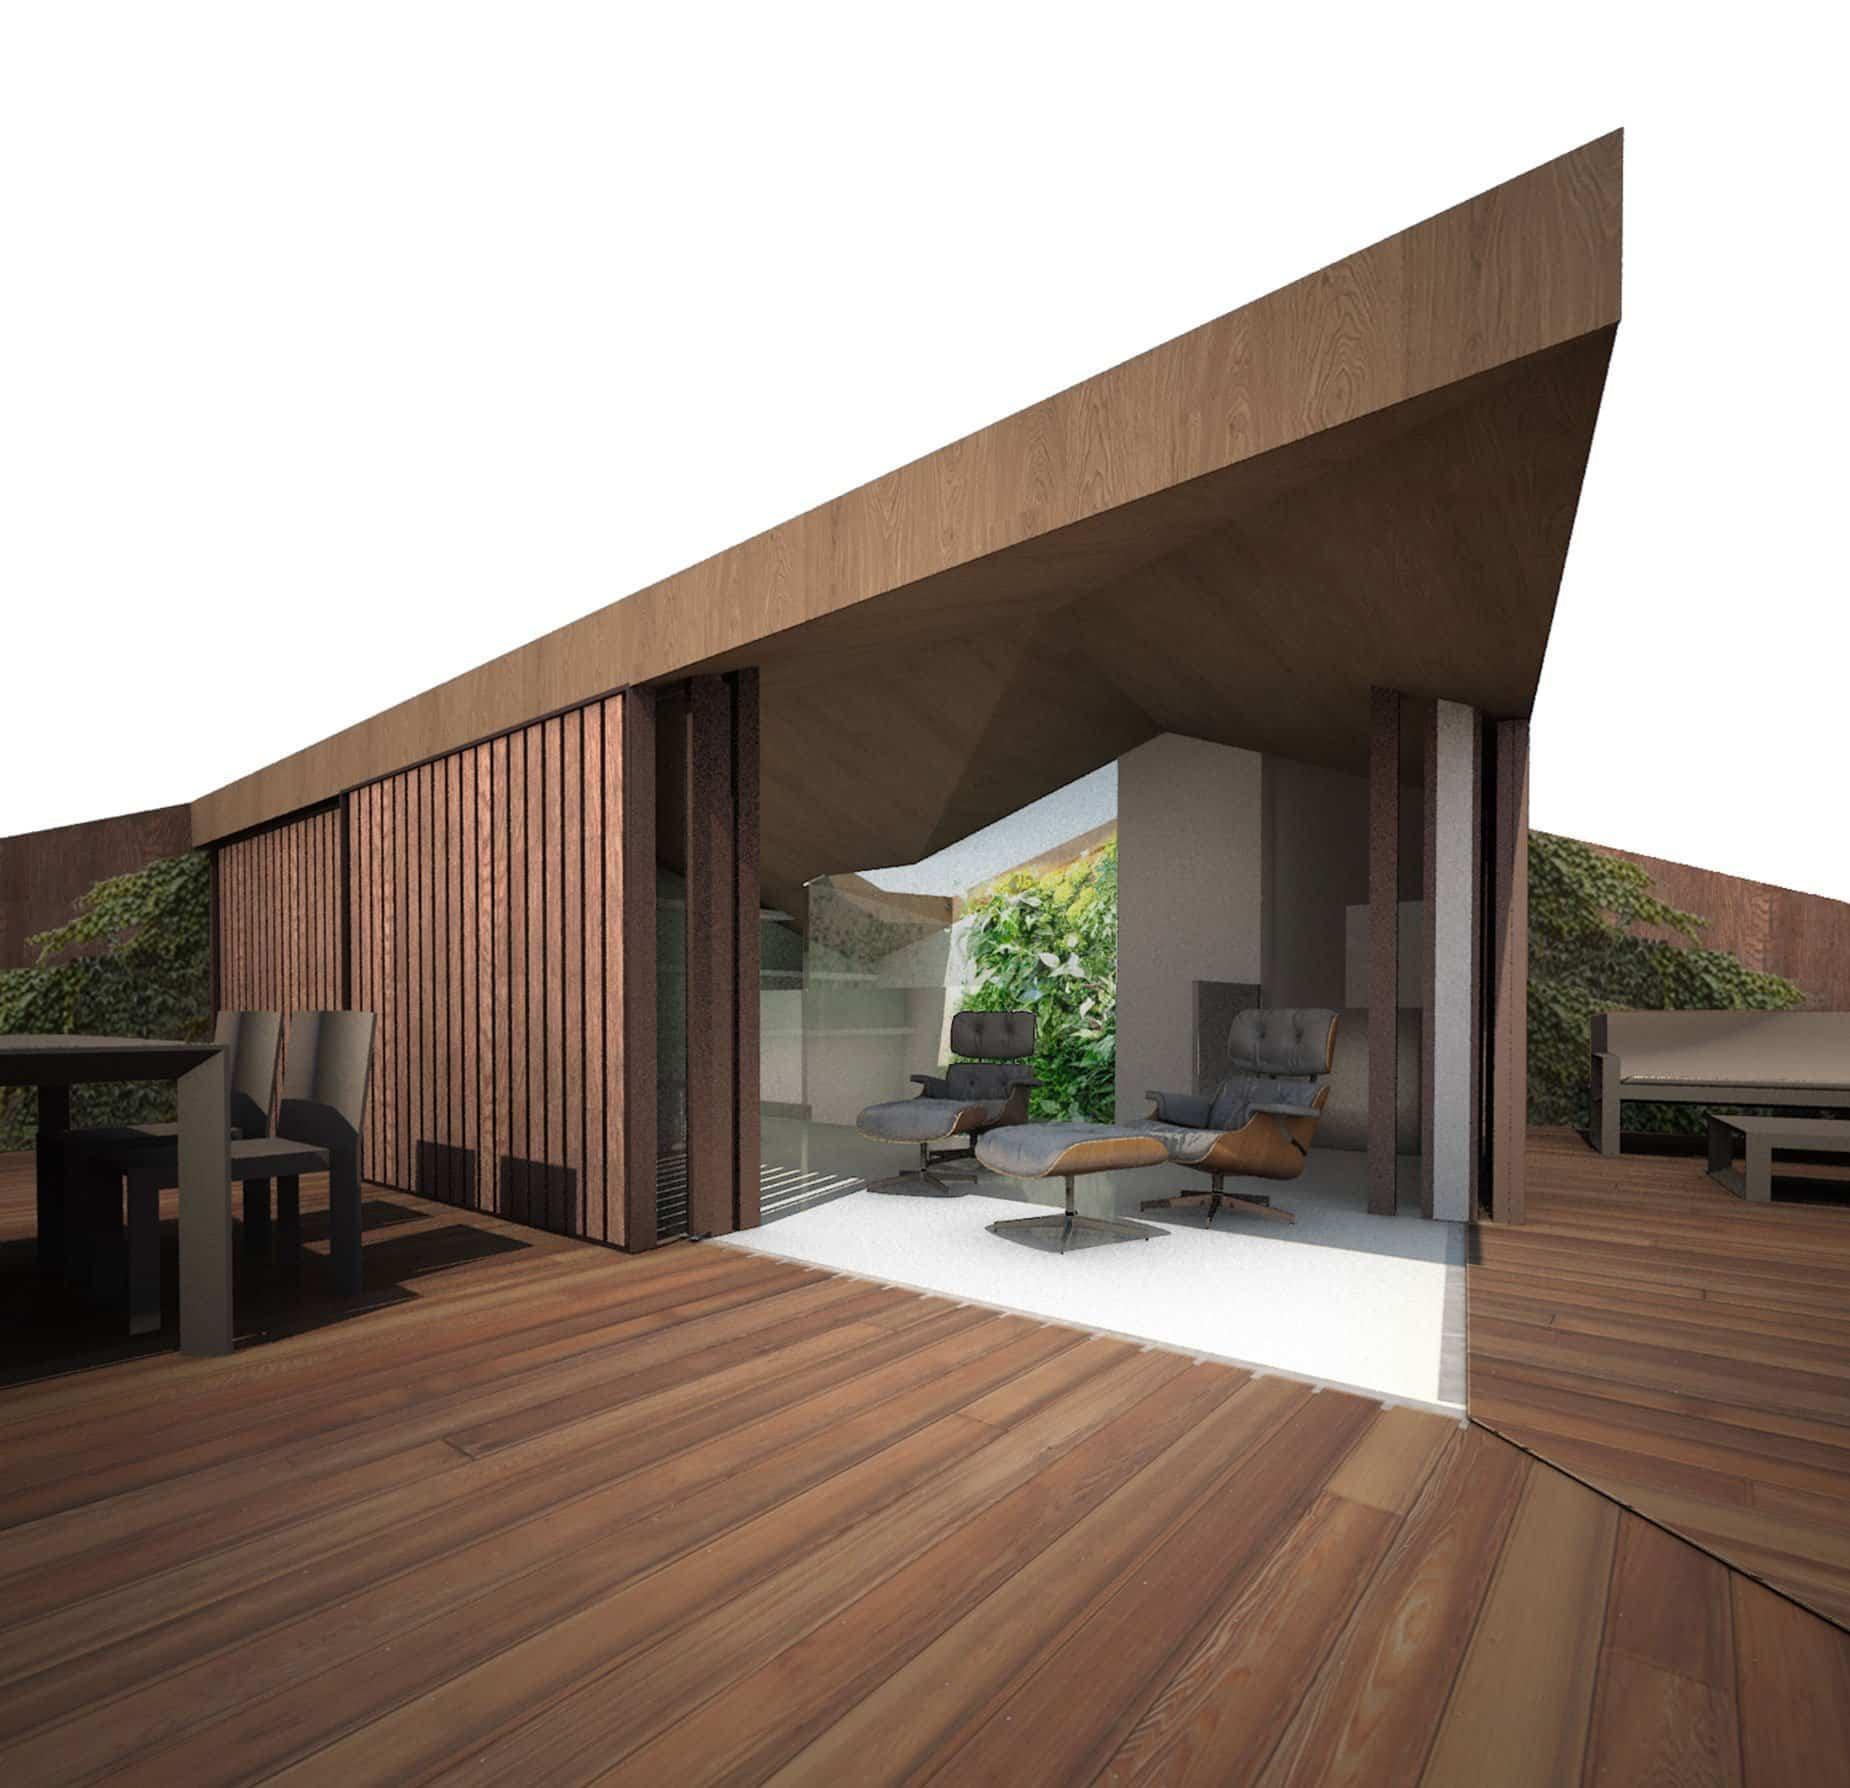 arquitectura cultivada 3